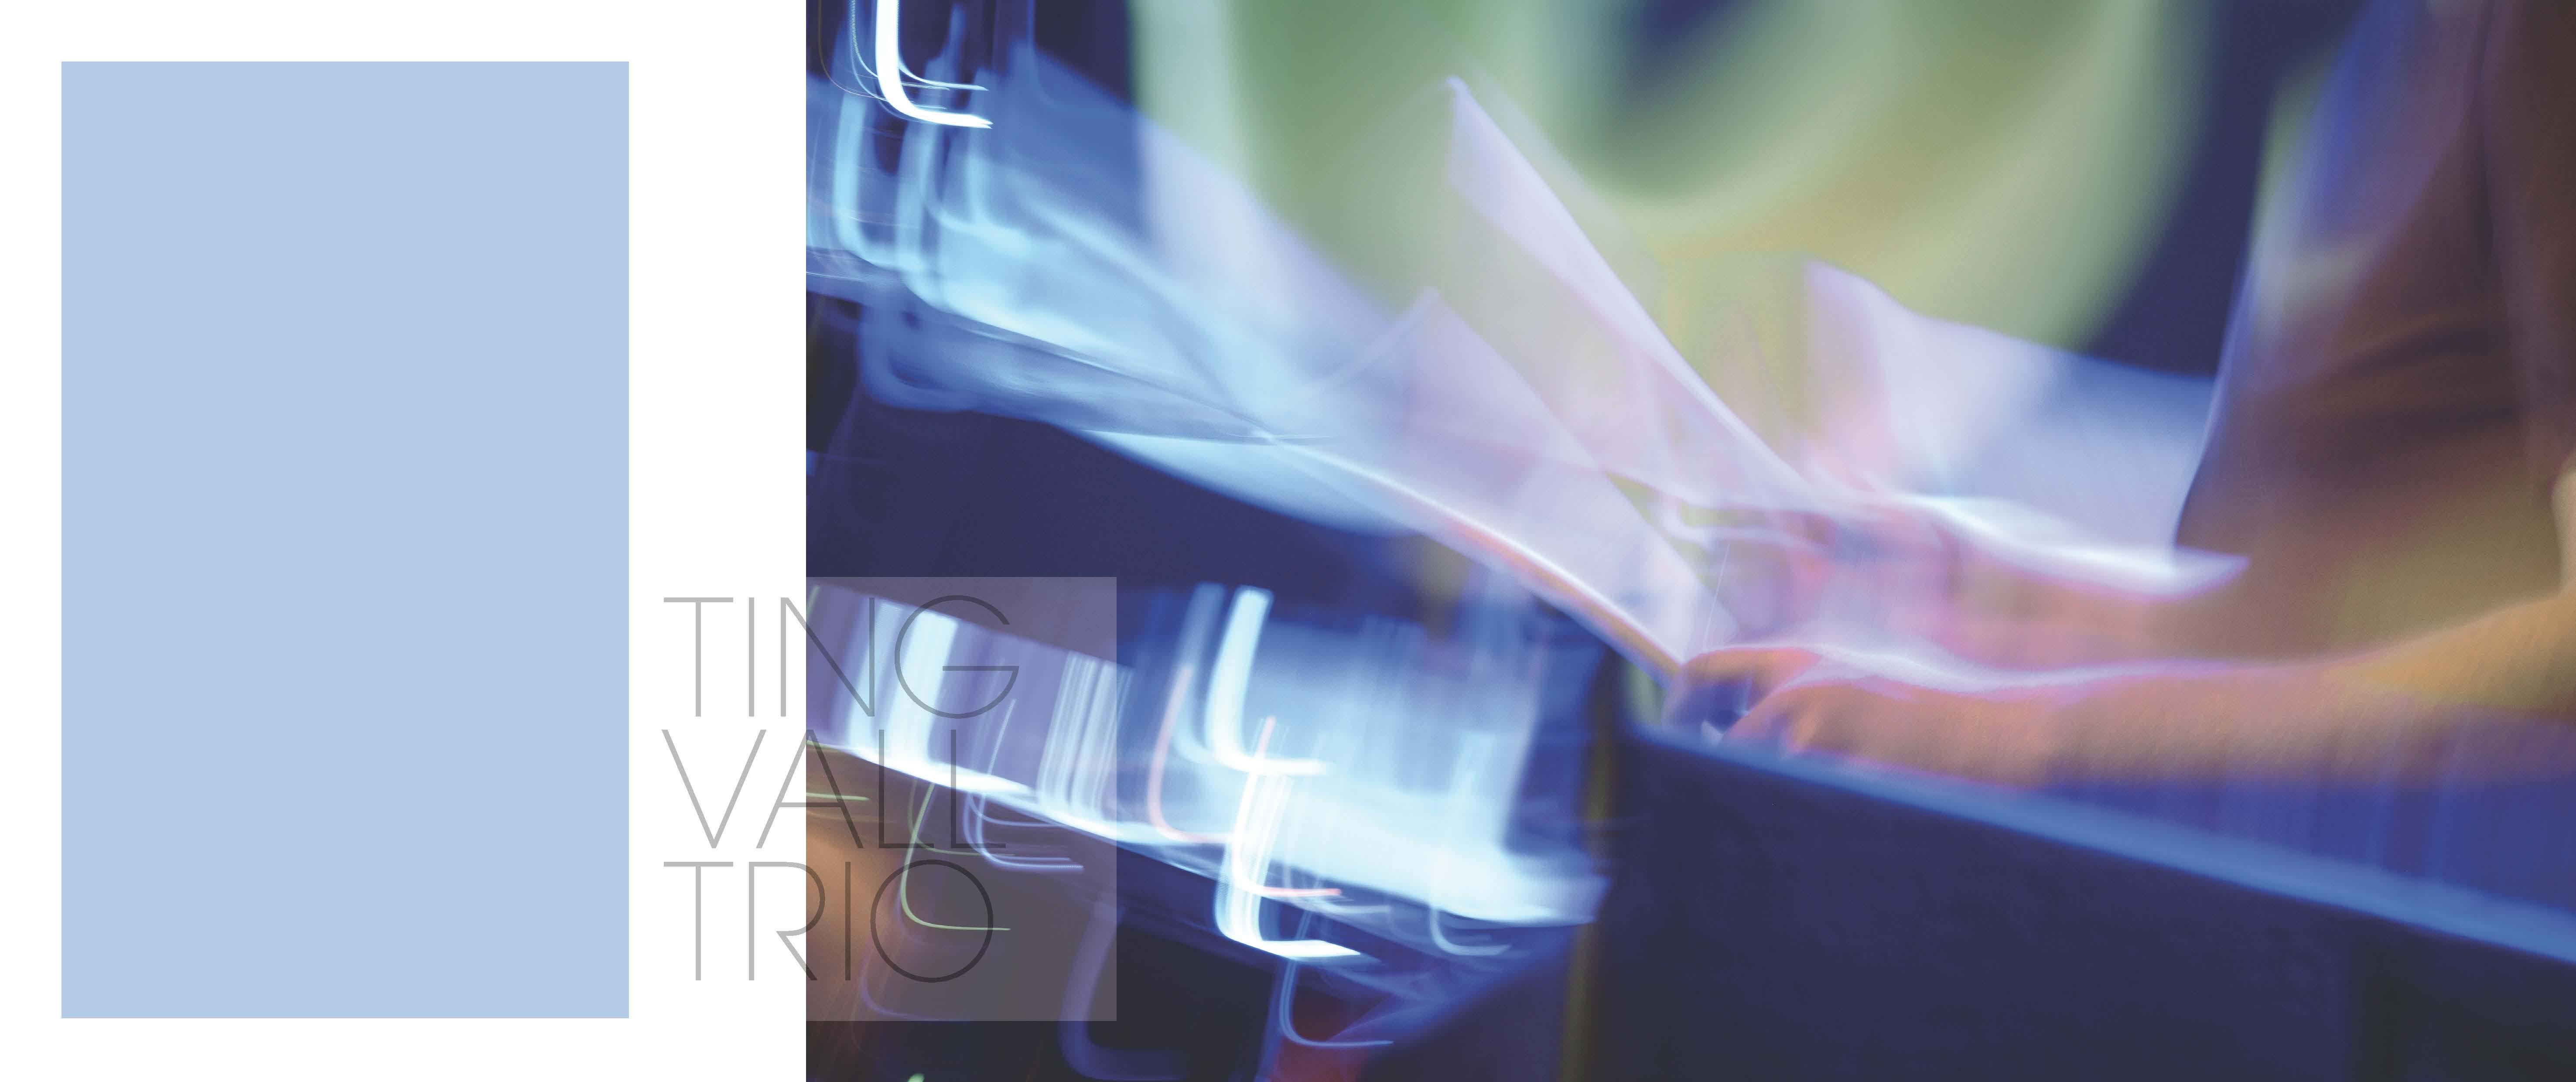 photographie evenementielle,Appareil photo,Studio photo,evenementielle entreprise,dubai,Appareil photo,Appareil photo,studio photo lyon,Creatif,Photographe studio,Creatif,Appareil photo,communications,Biarritz,lille,Book photo Lyon,Photographe studio